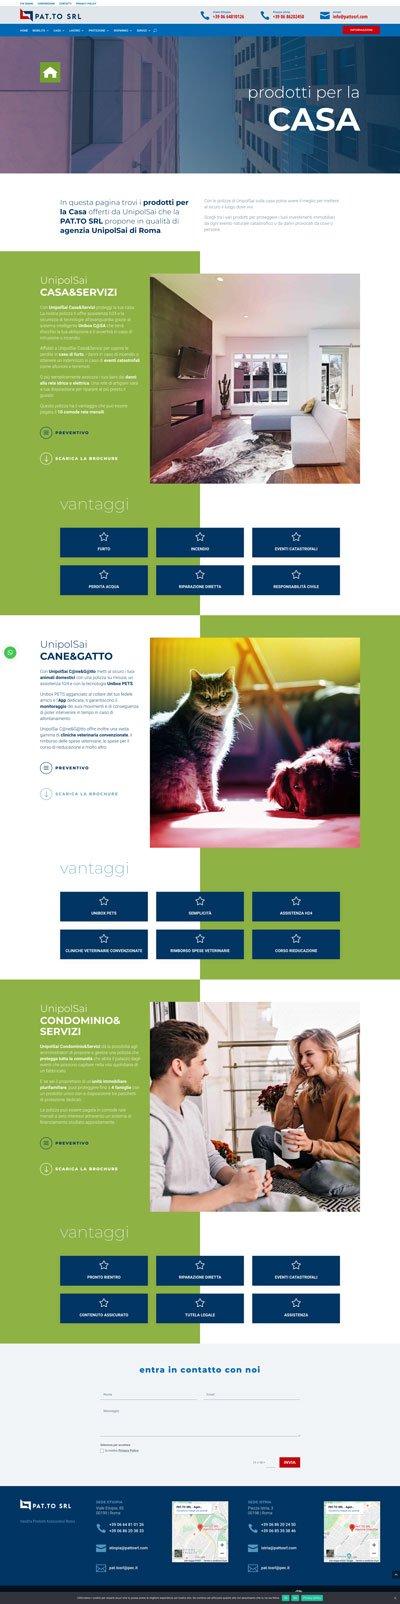 PATTOSRL-CASA-2021-06-01-18_29_29